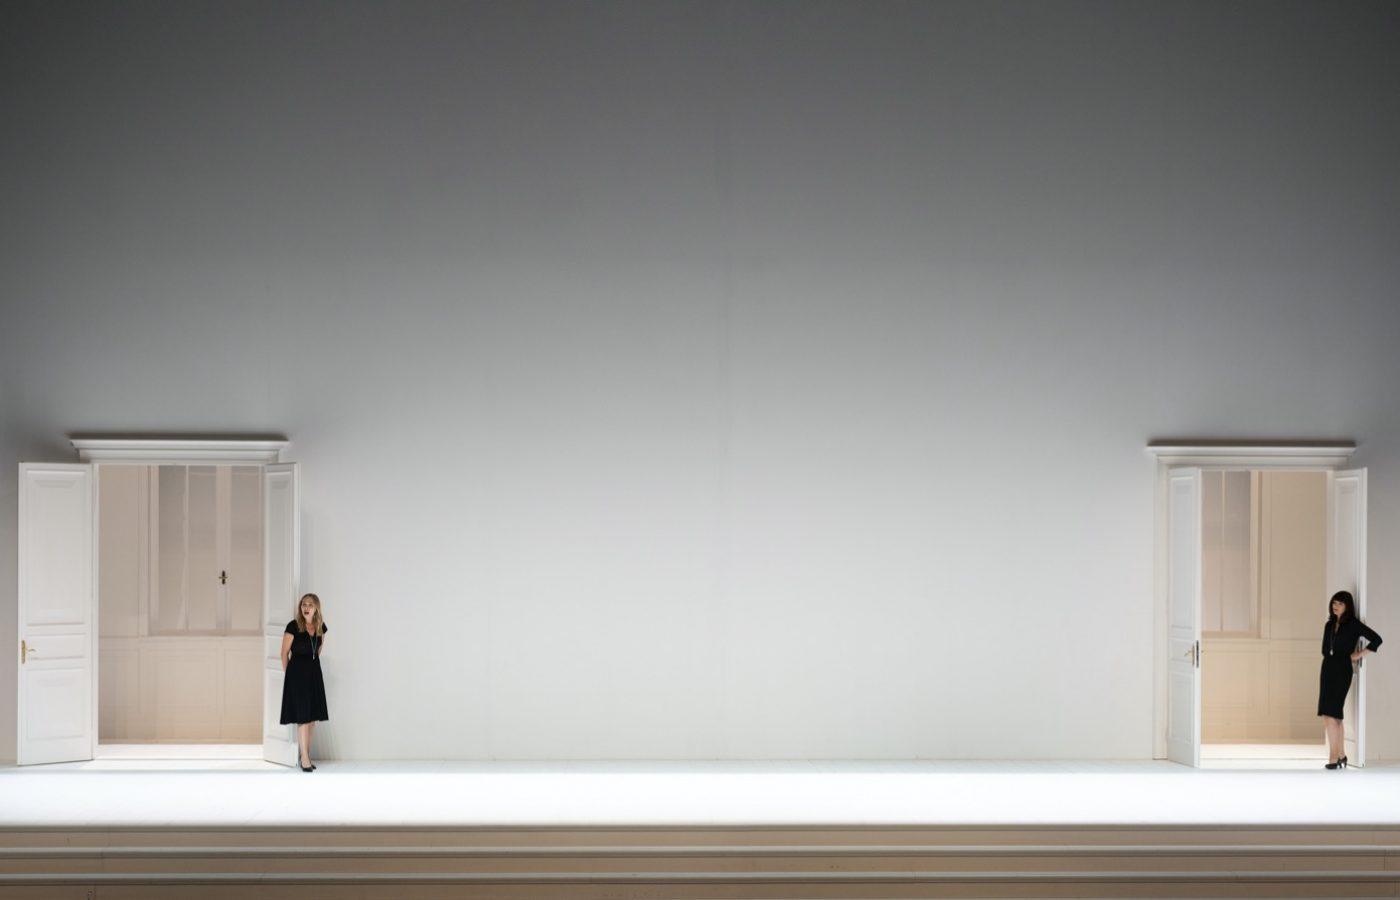 Leiacker-Loy-Cosi-Fan-Tutte-Monika-Rittershaus-Salzburger-Festspiele-2020-00116